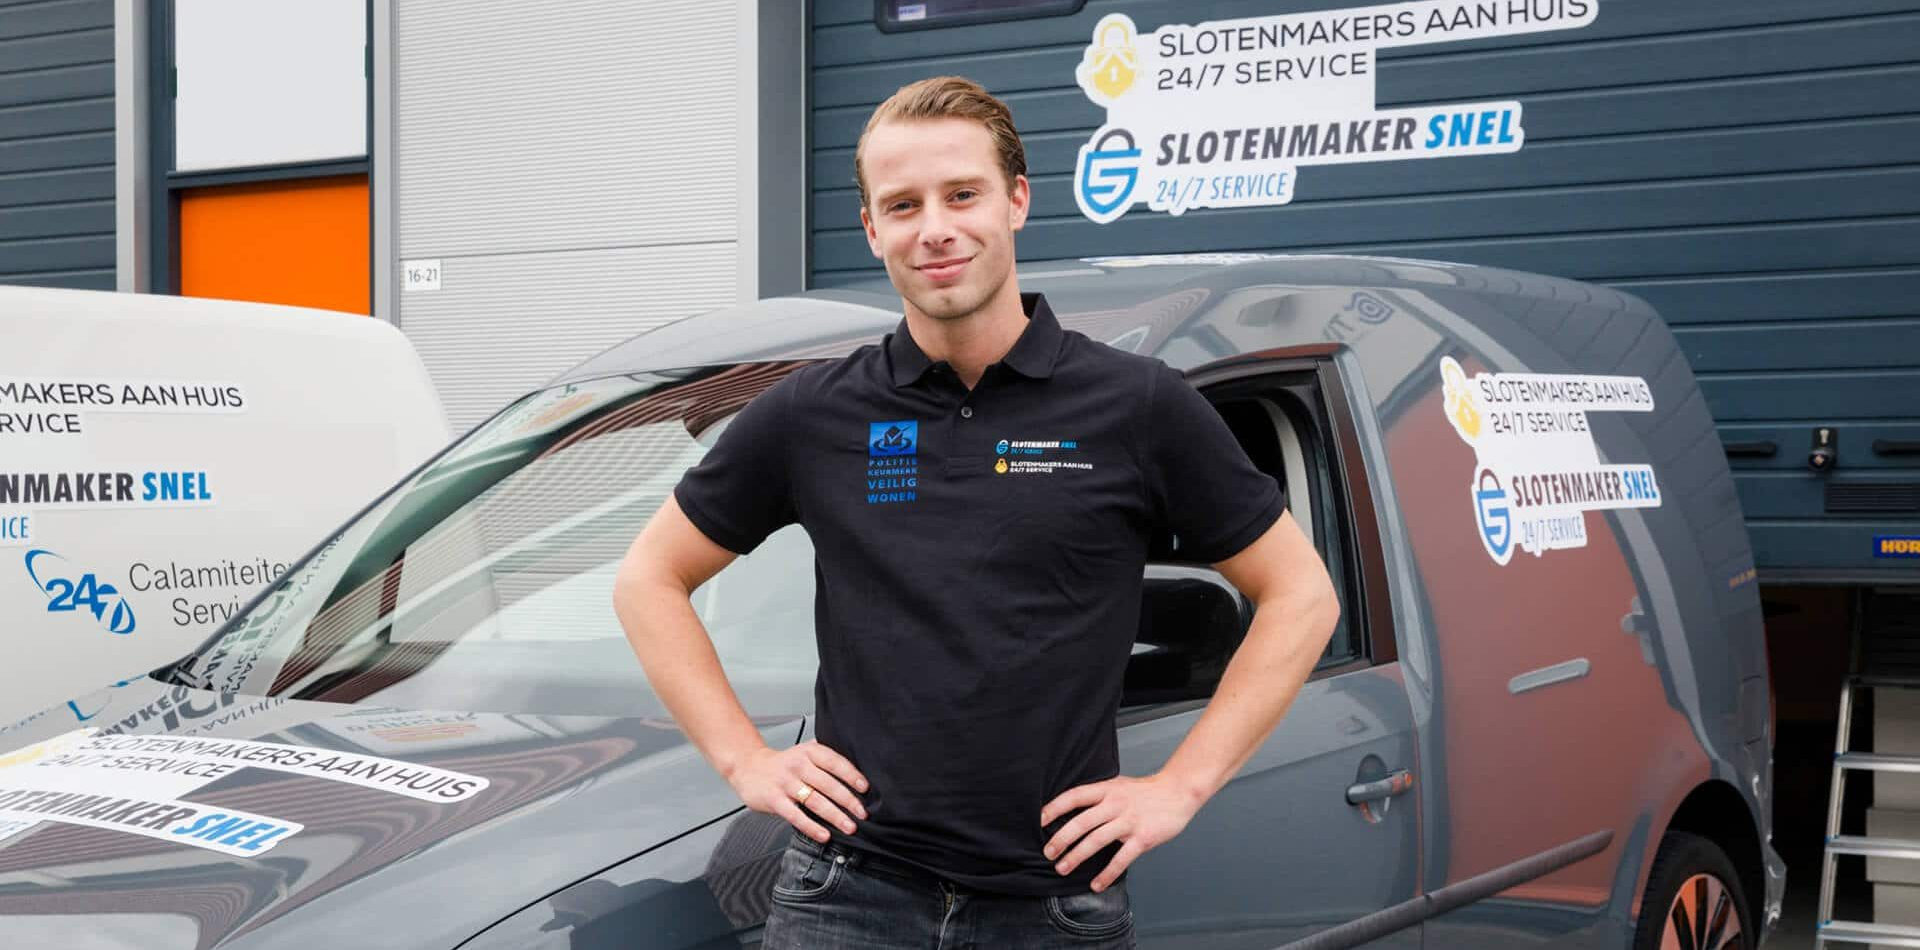 Slotenmaker Woudenberg